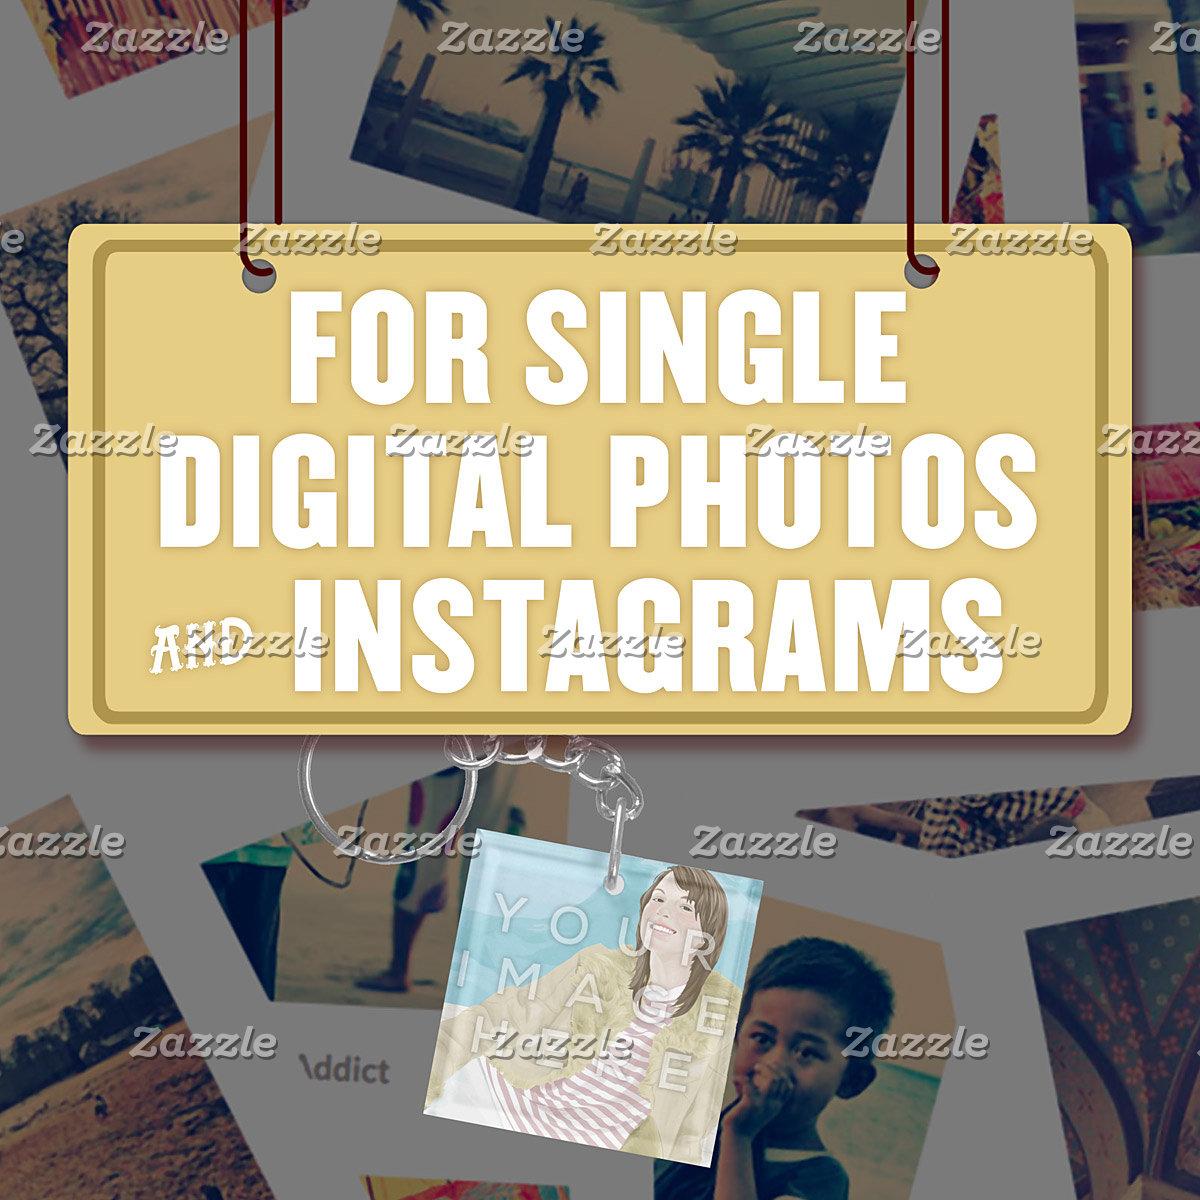 For Single (1) Digital Photos & Instagrams